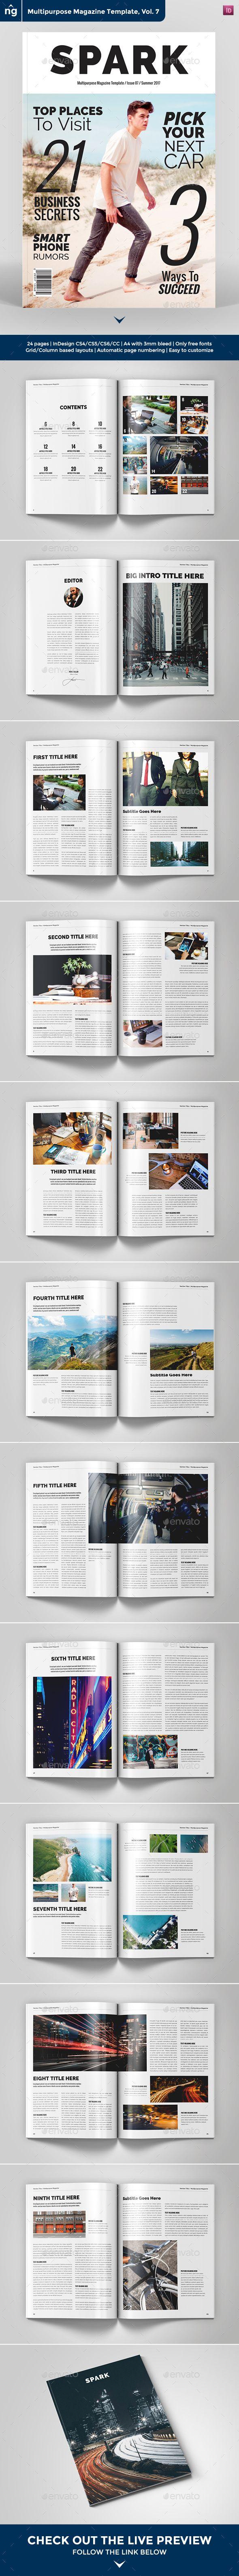 Multipurpose Magazine Template | ☆ DIY ☆ | Pinterest